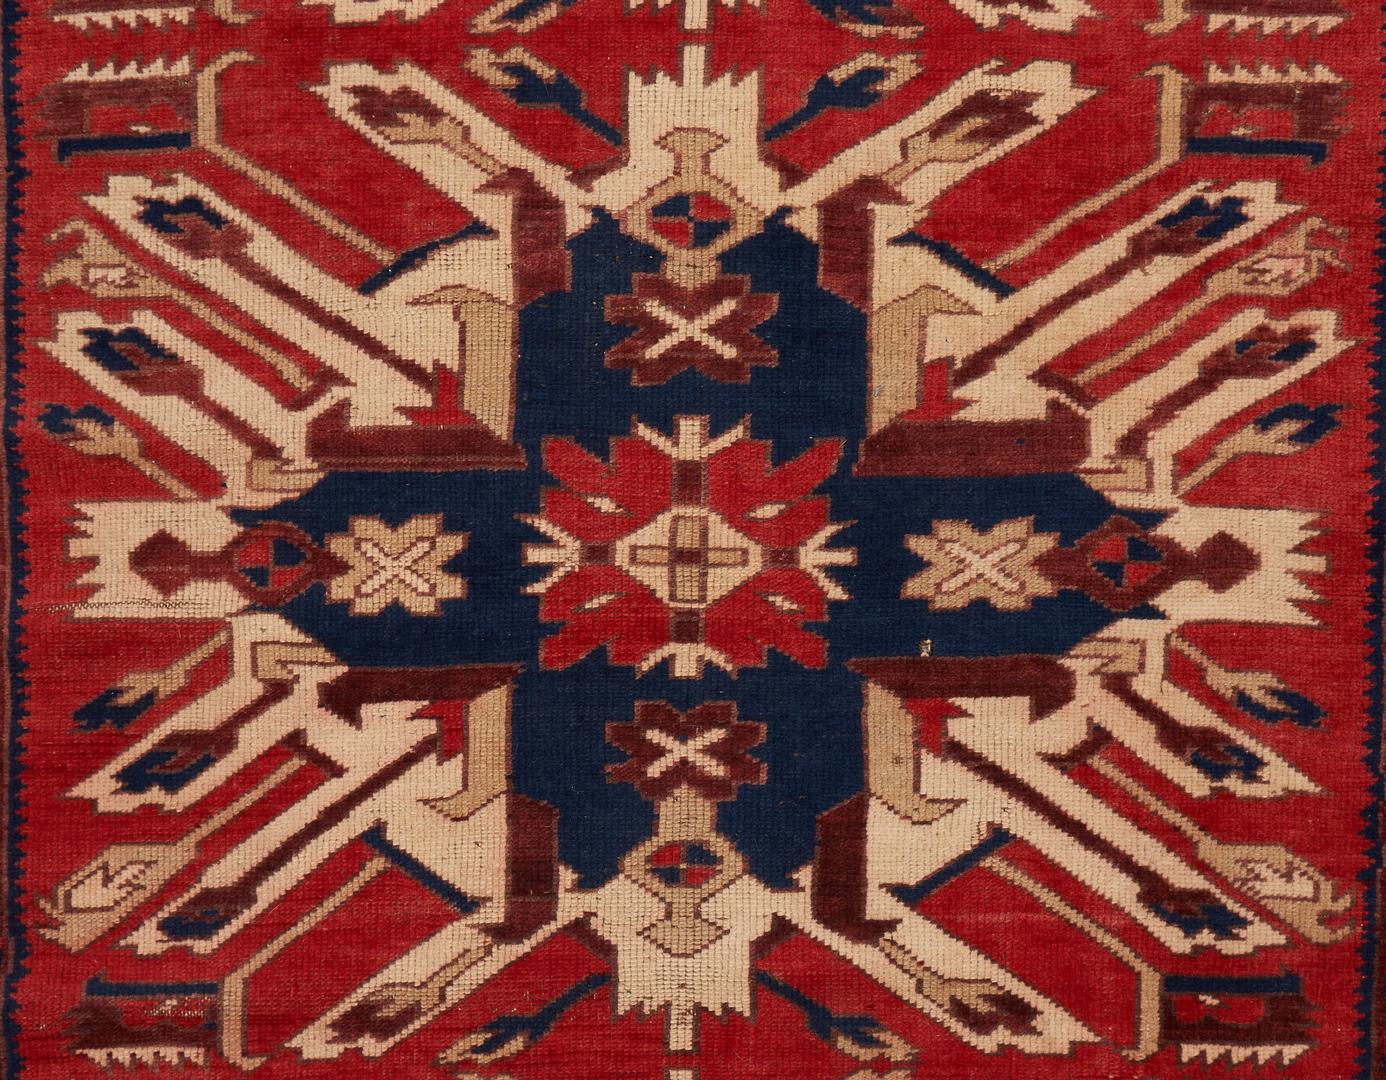 Lot 615: Turkish Rug, Kazak Eagle Design